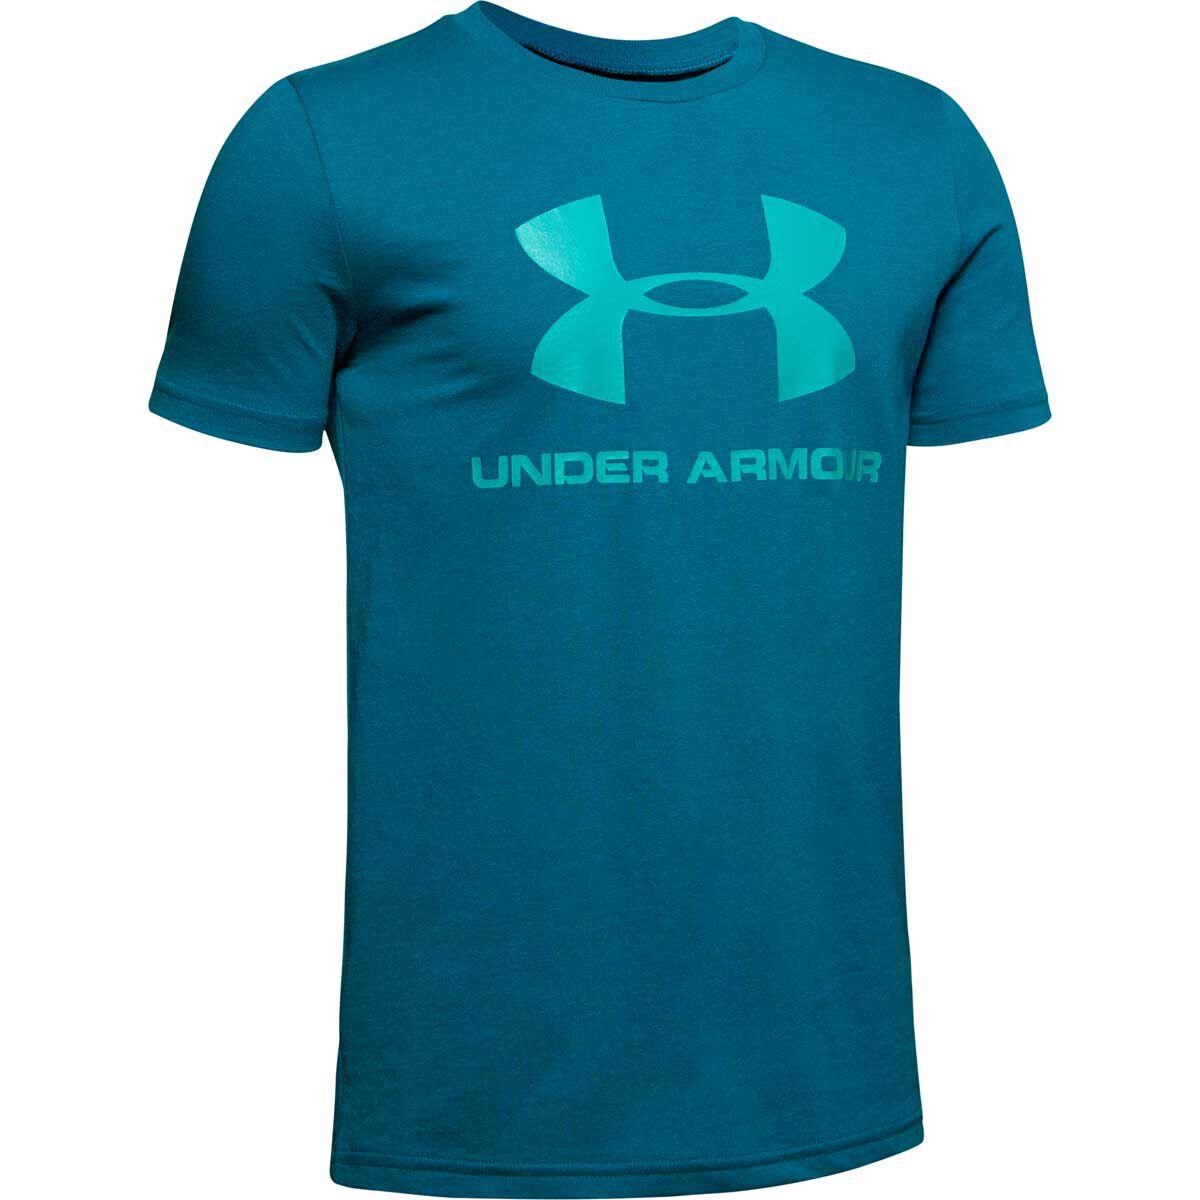 under armor boys clothes